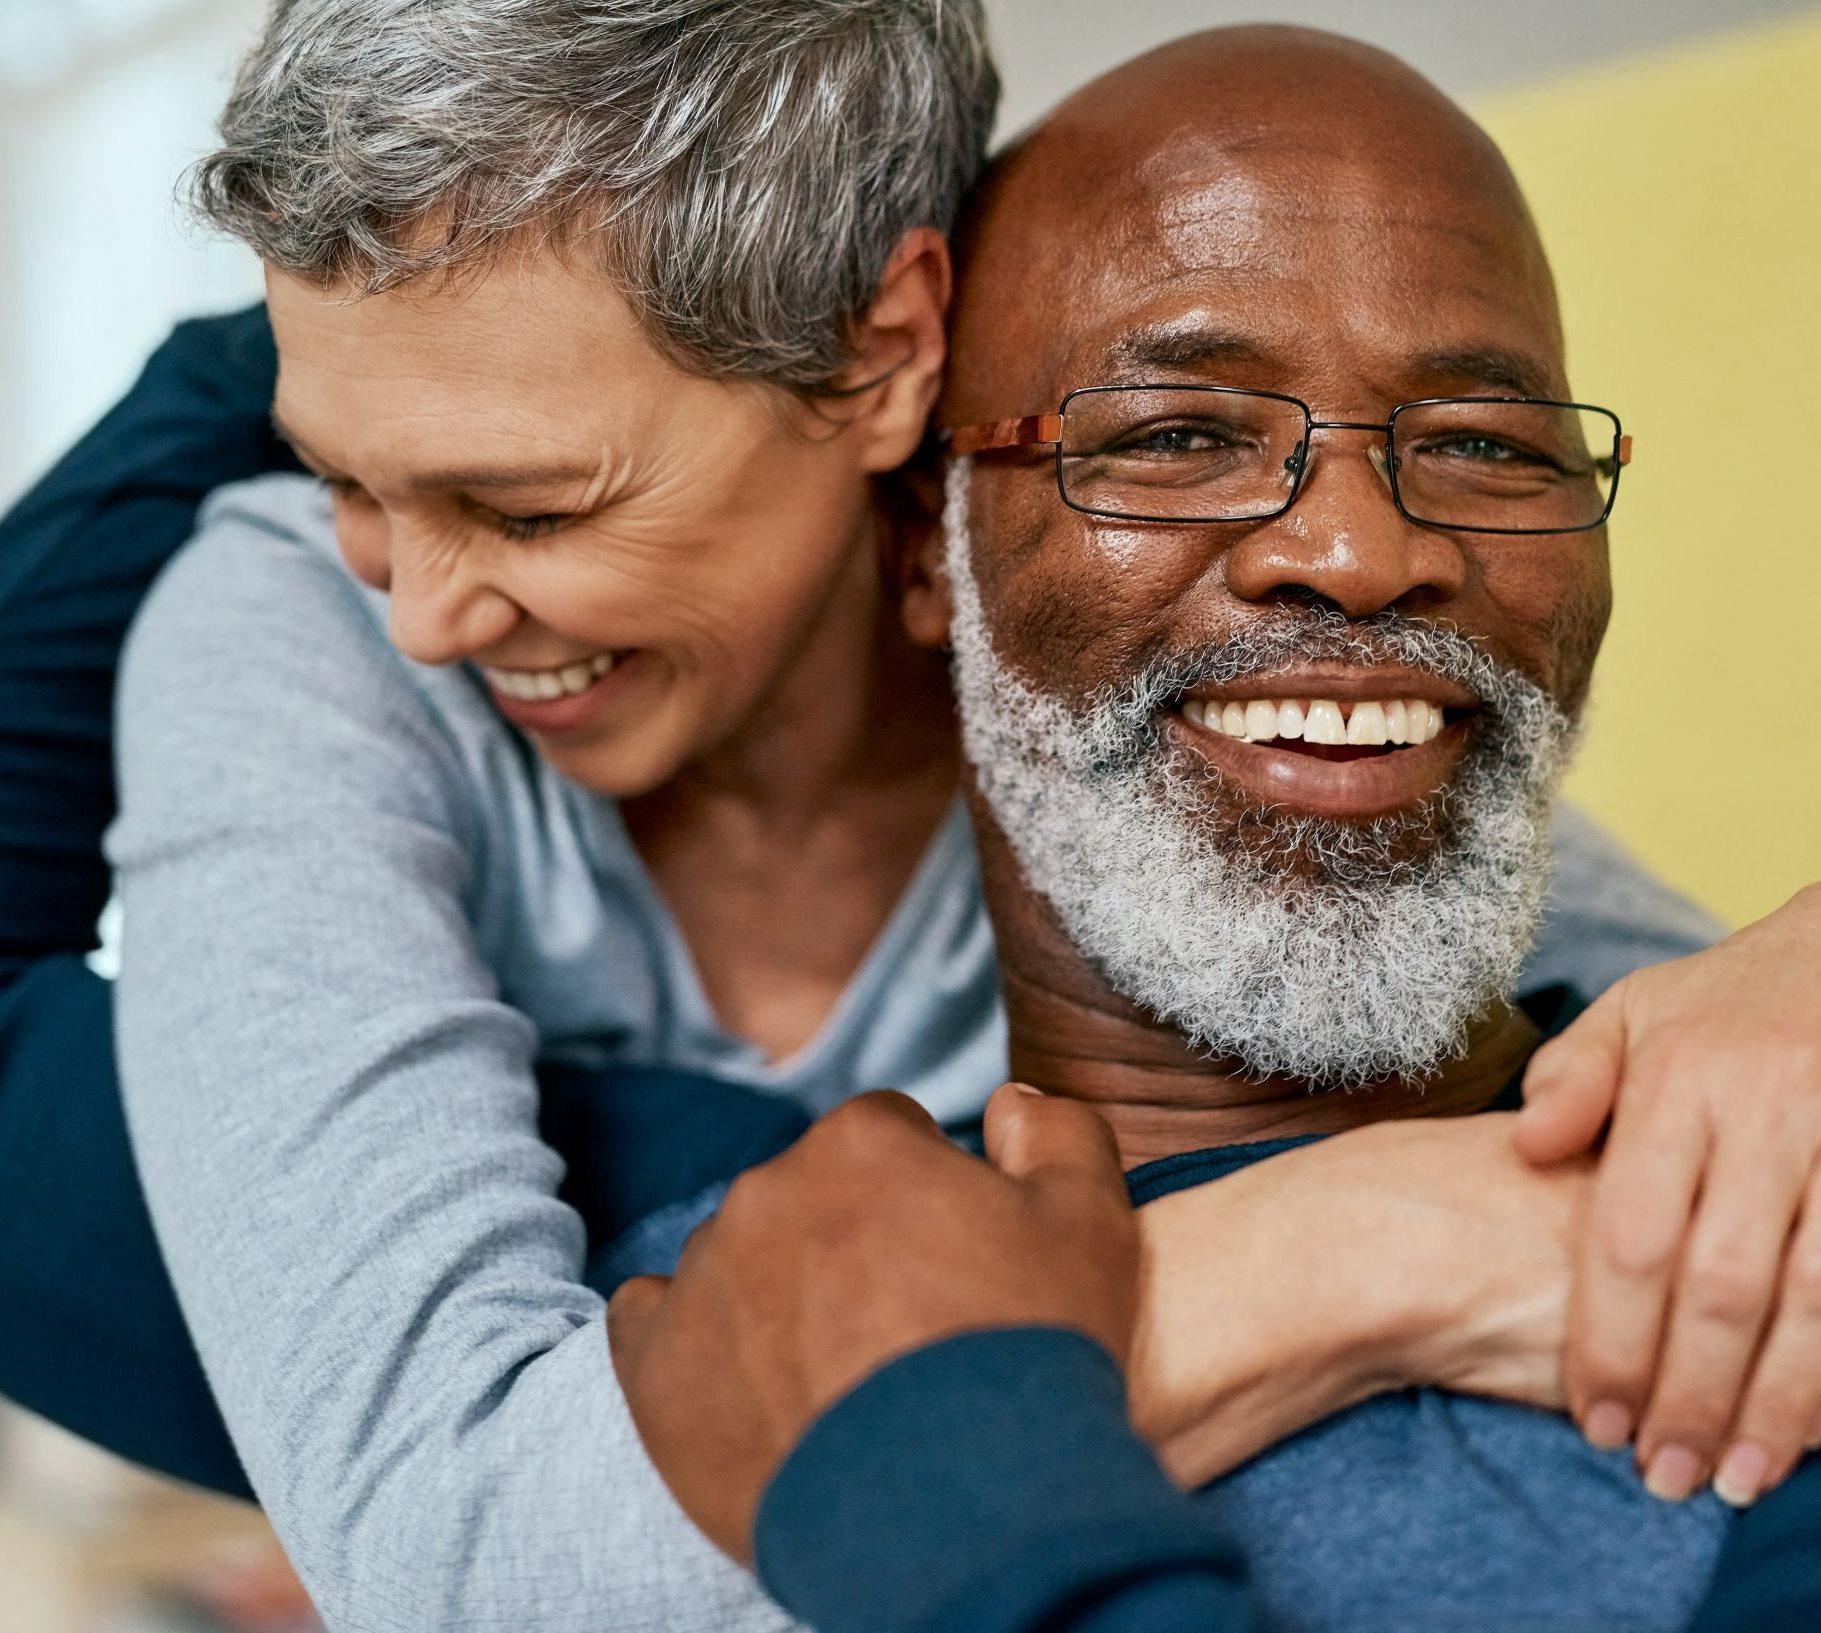 Elderly Male and Female Hugging